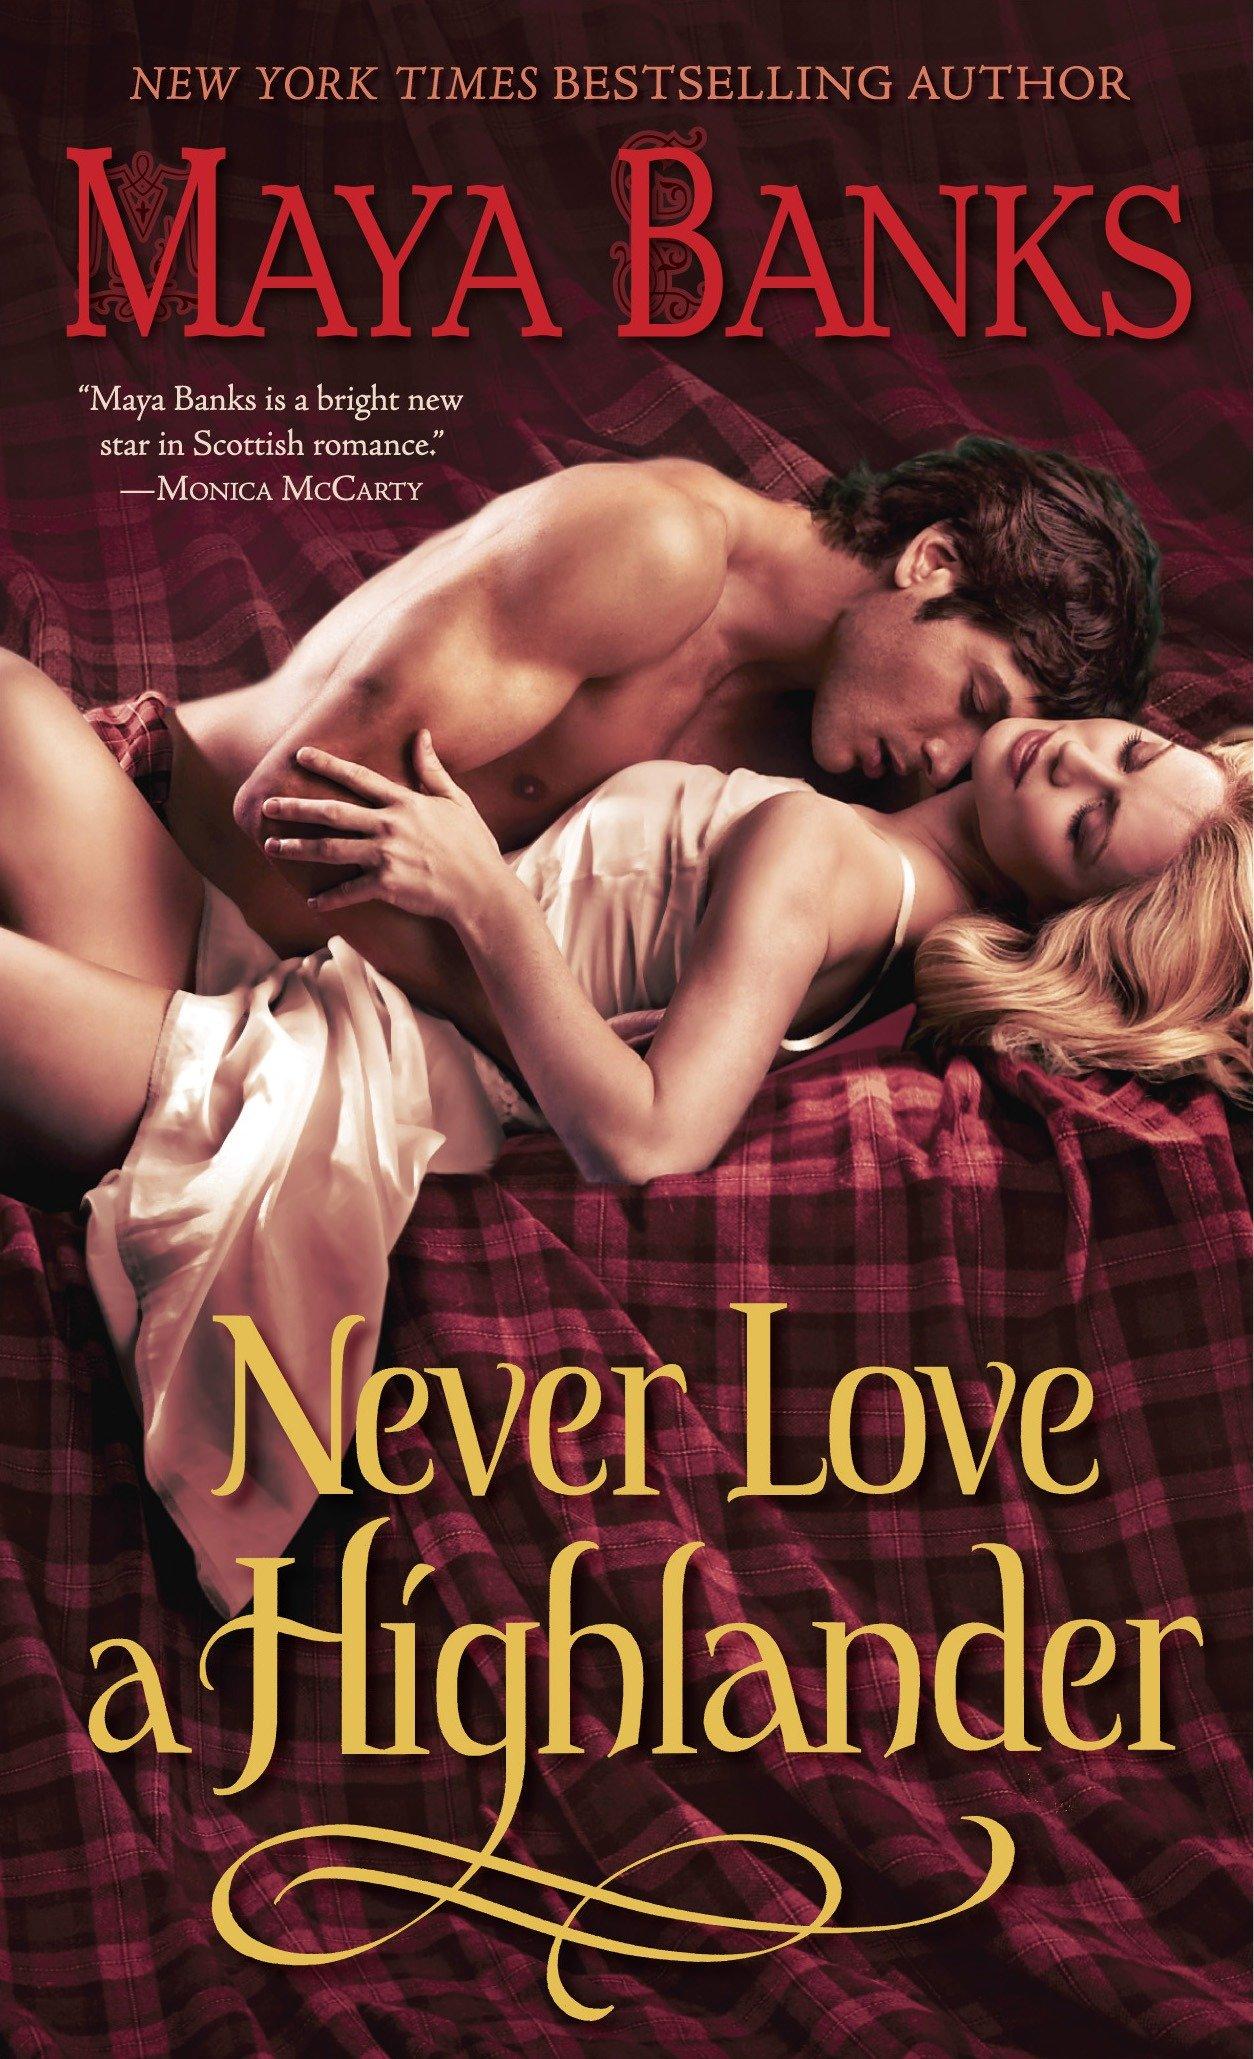 Never love a highlander cover image